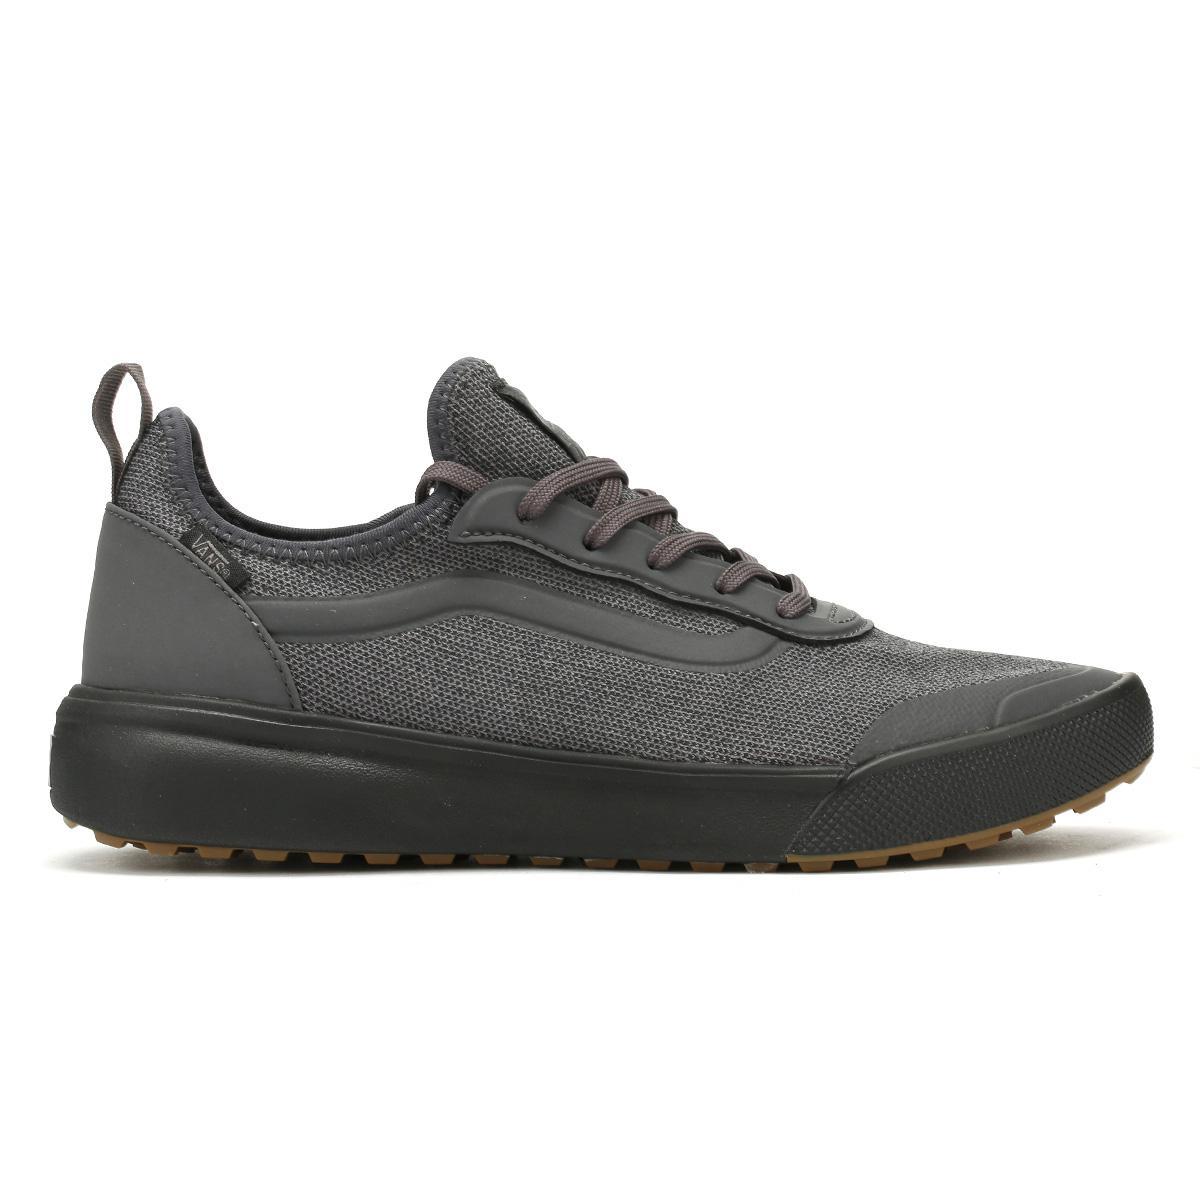 Lyst - Vans Mens Asphalt Black Knit Ultrarange Ac Trainers in Black ... 2105345b8